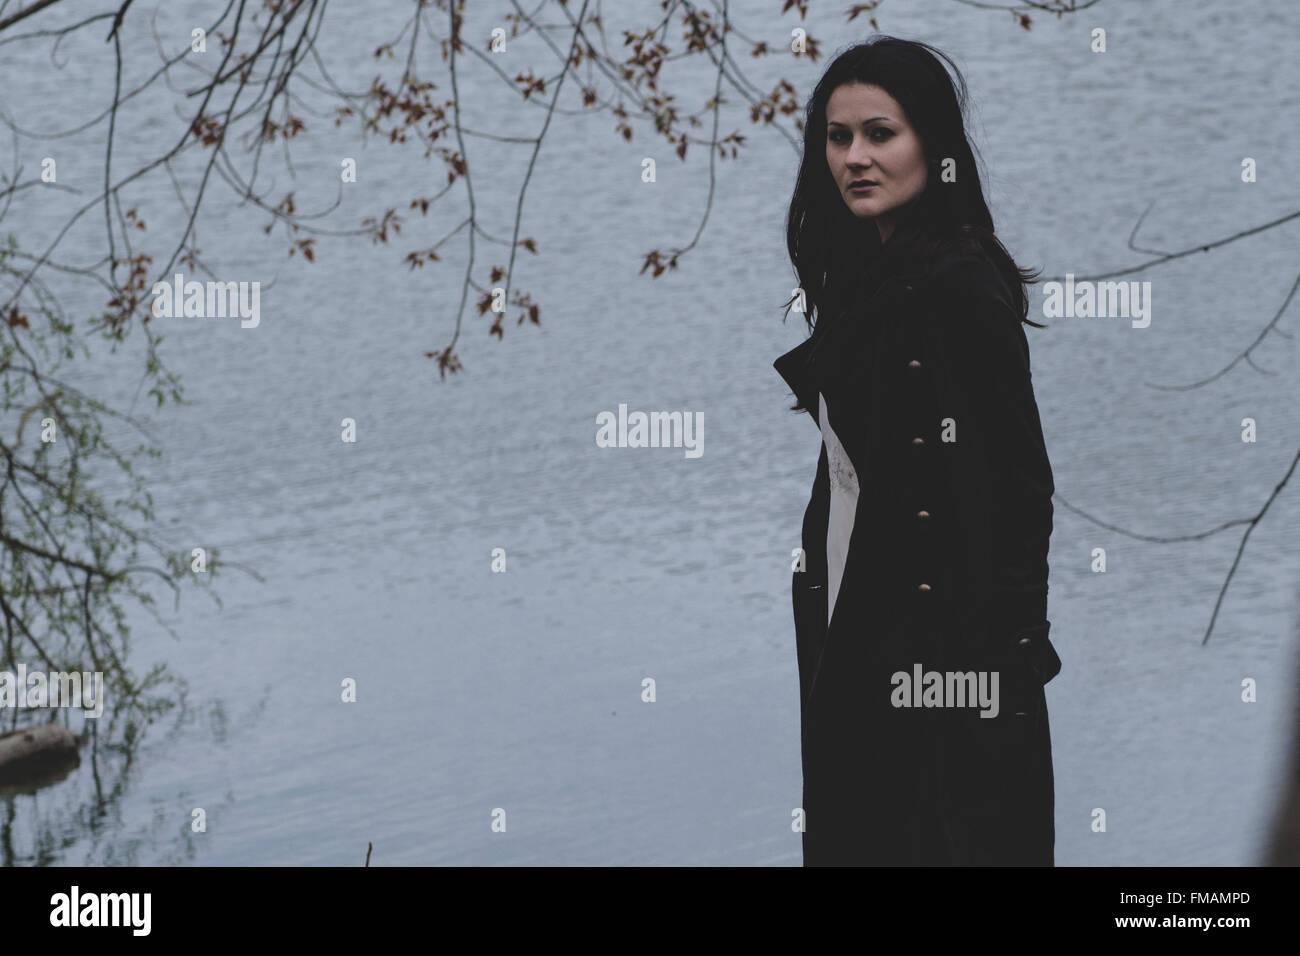 Girl walk alone melancholic mood - Stock Image